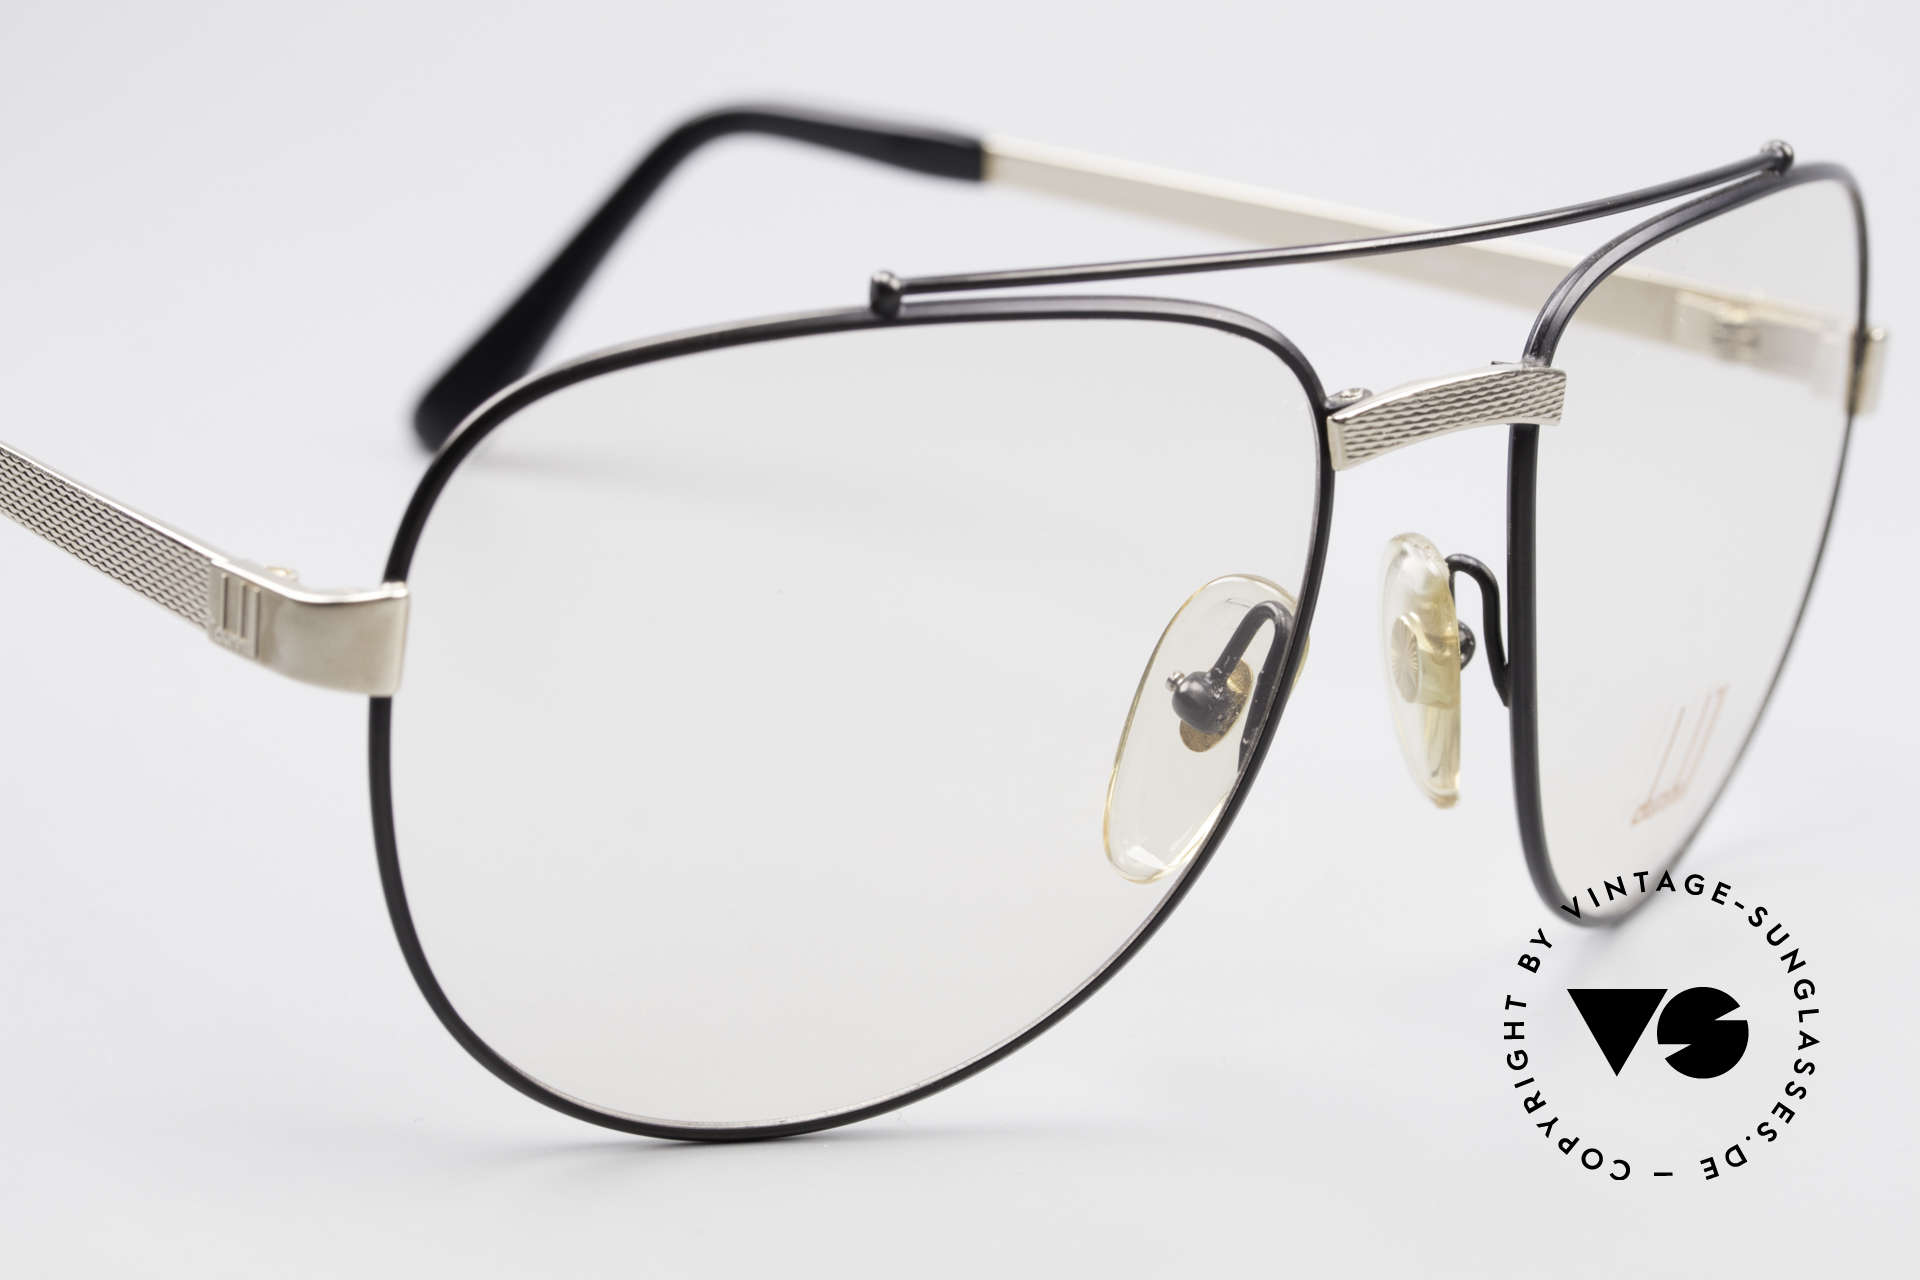 Dunhill 6029 Comfort Fit Luxury Eyeglasses, unworn (like all our VINTAGE luxury eyeglasses), Made for Men